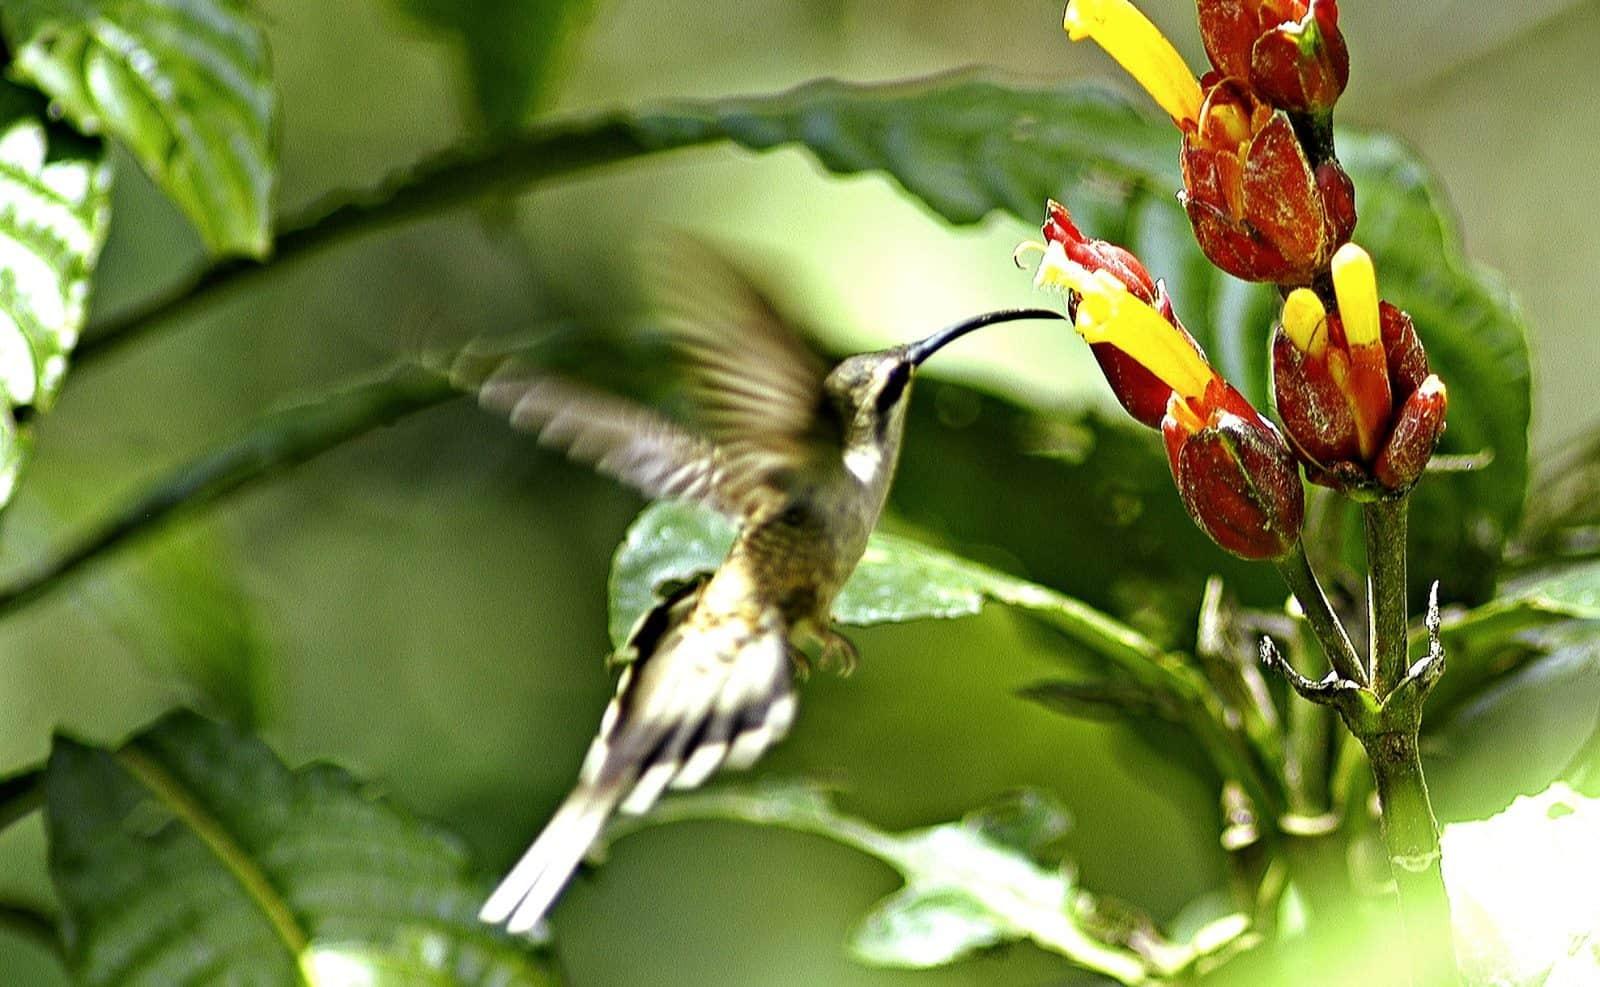 Flora im Amazonas Regenwald